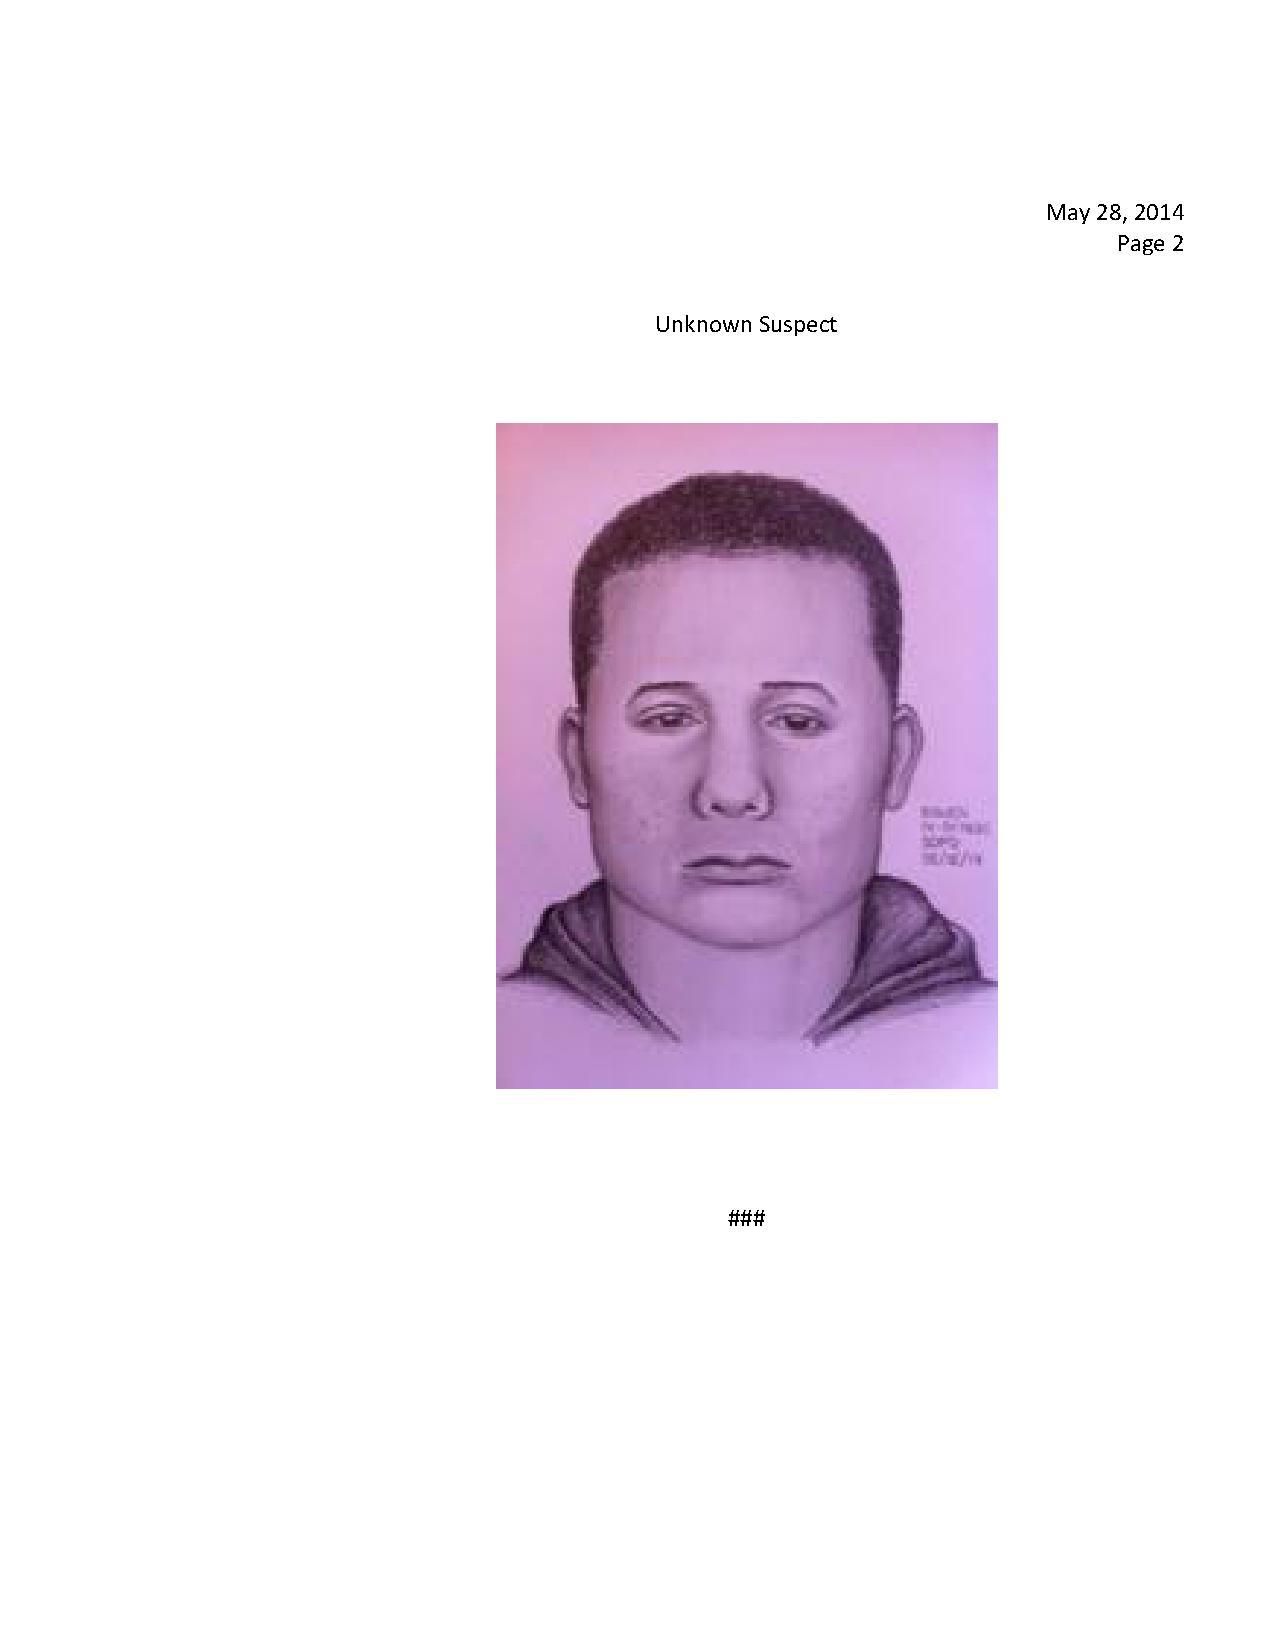 052814 La Jolla Robbery_2